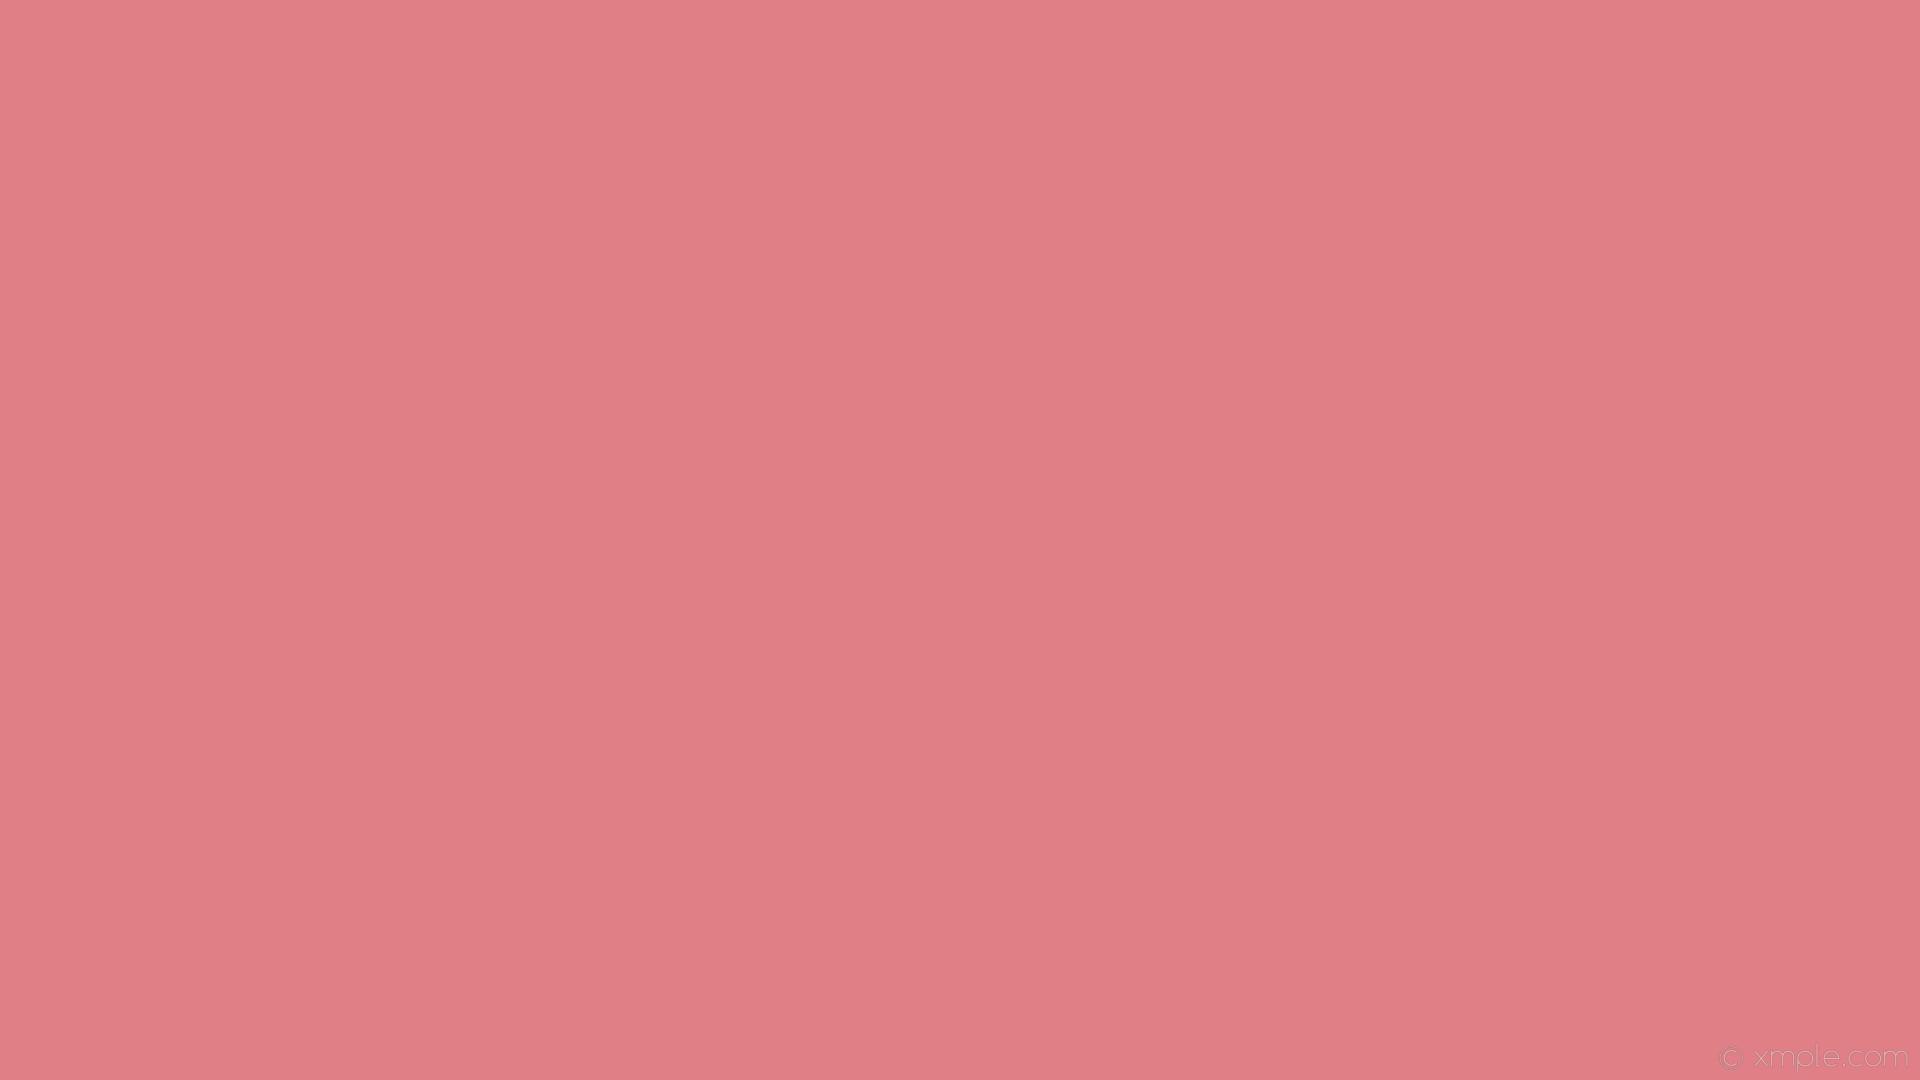 wallpaper solid color plain one colour single red #e07f86